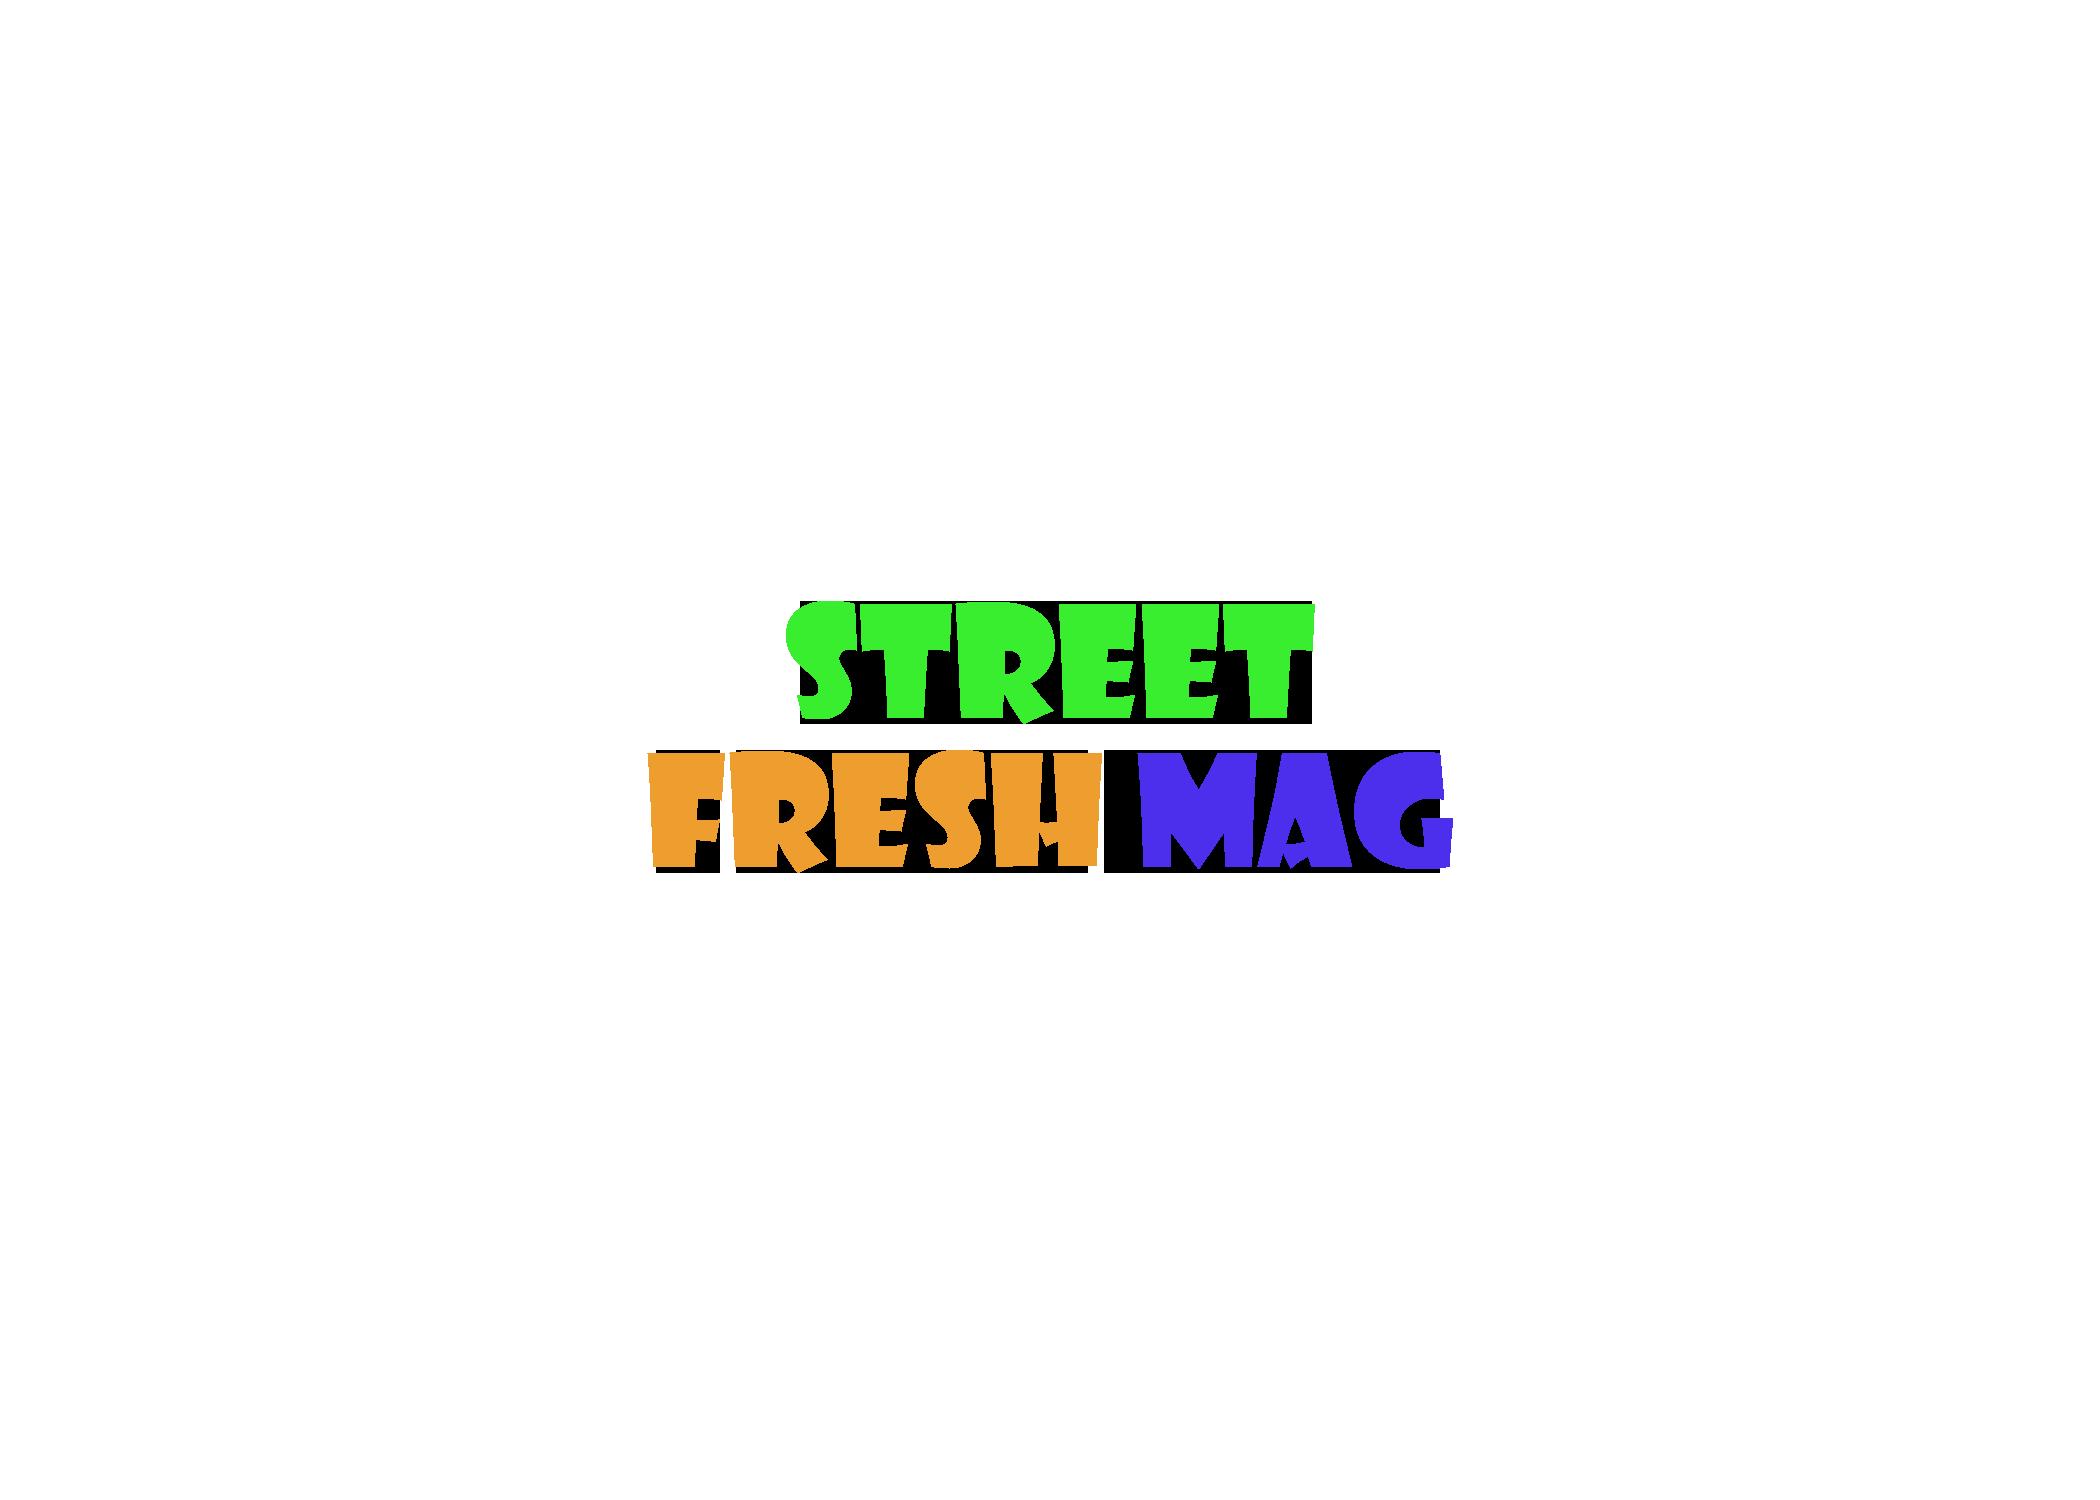 Street Fresh Mag